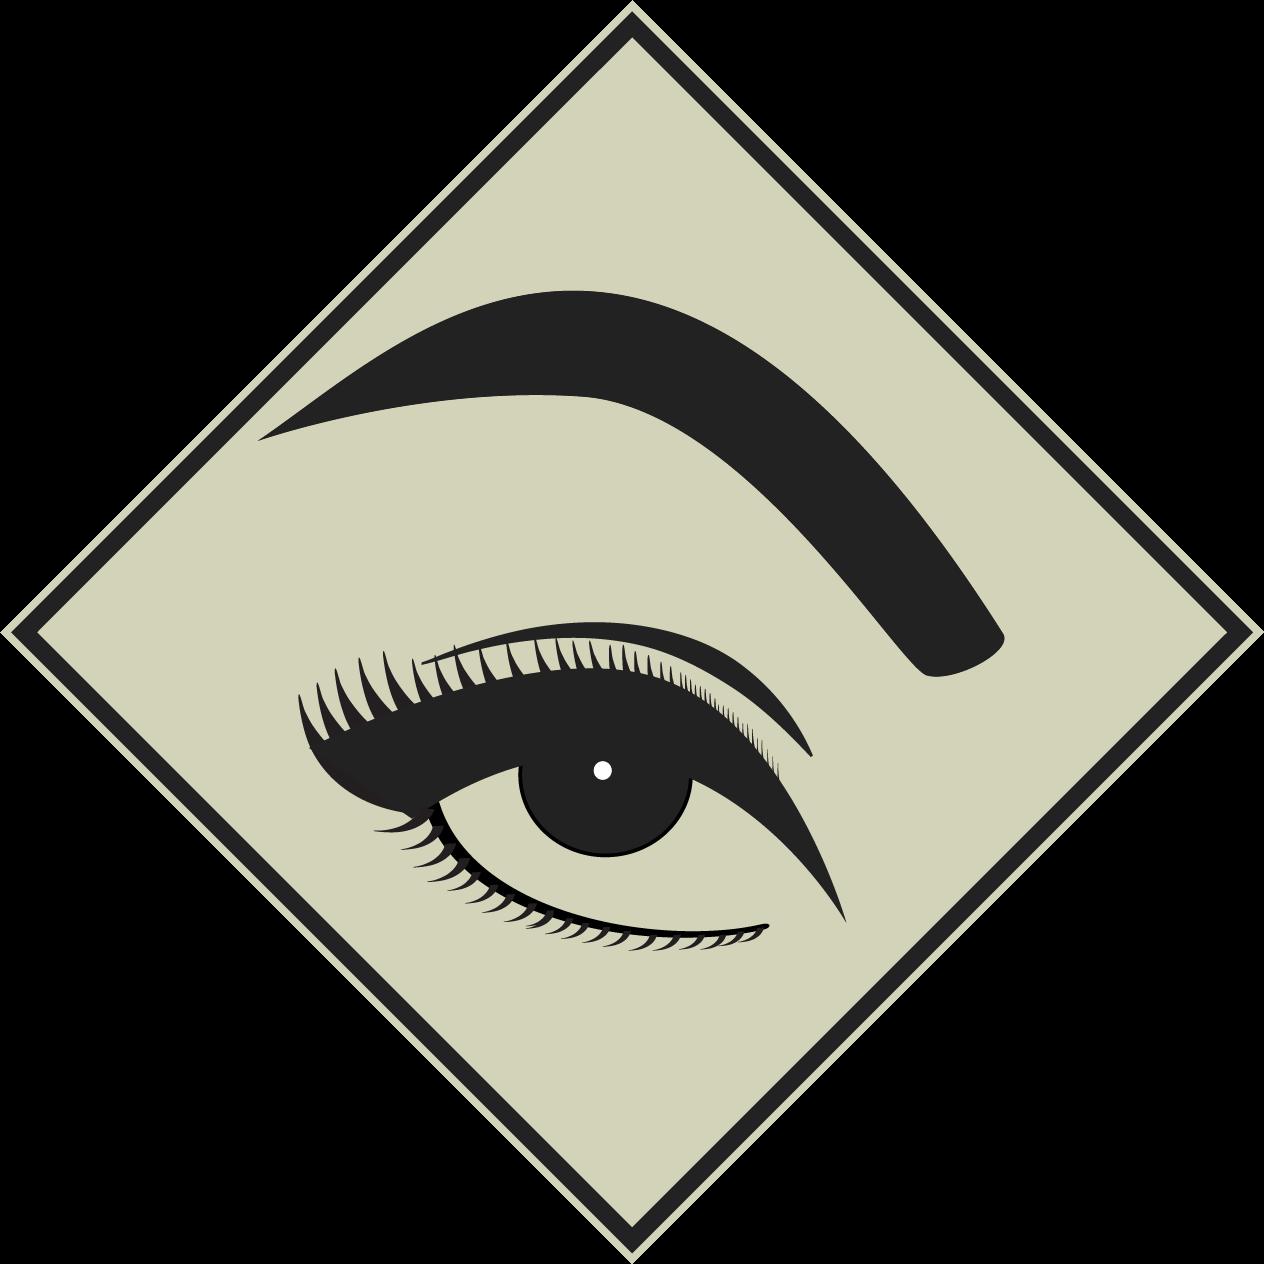 Makeup la do a. Eyelashes clipart perfect eyebrow